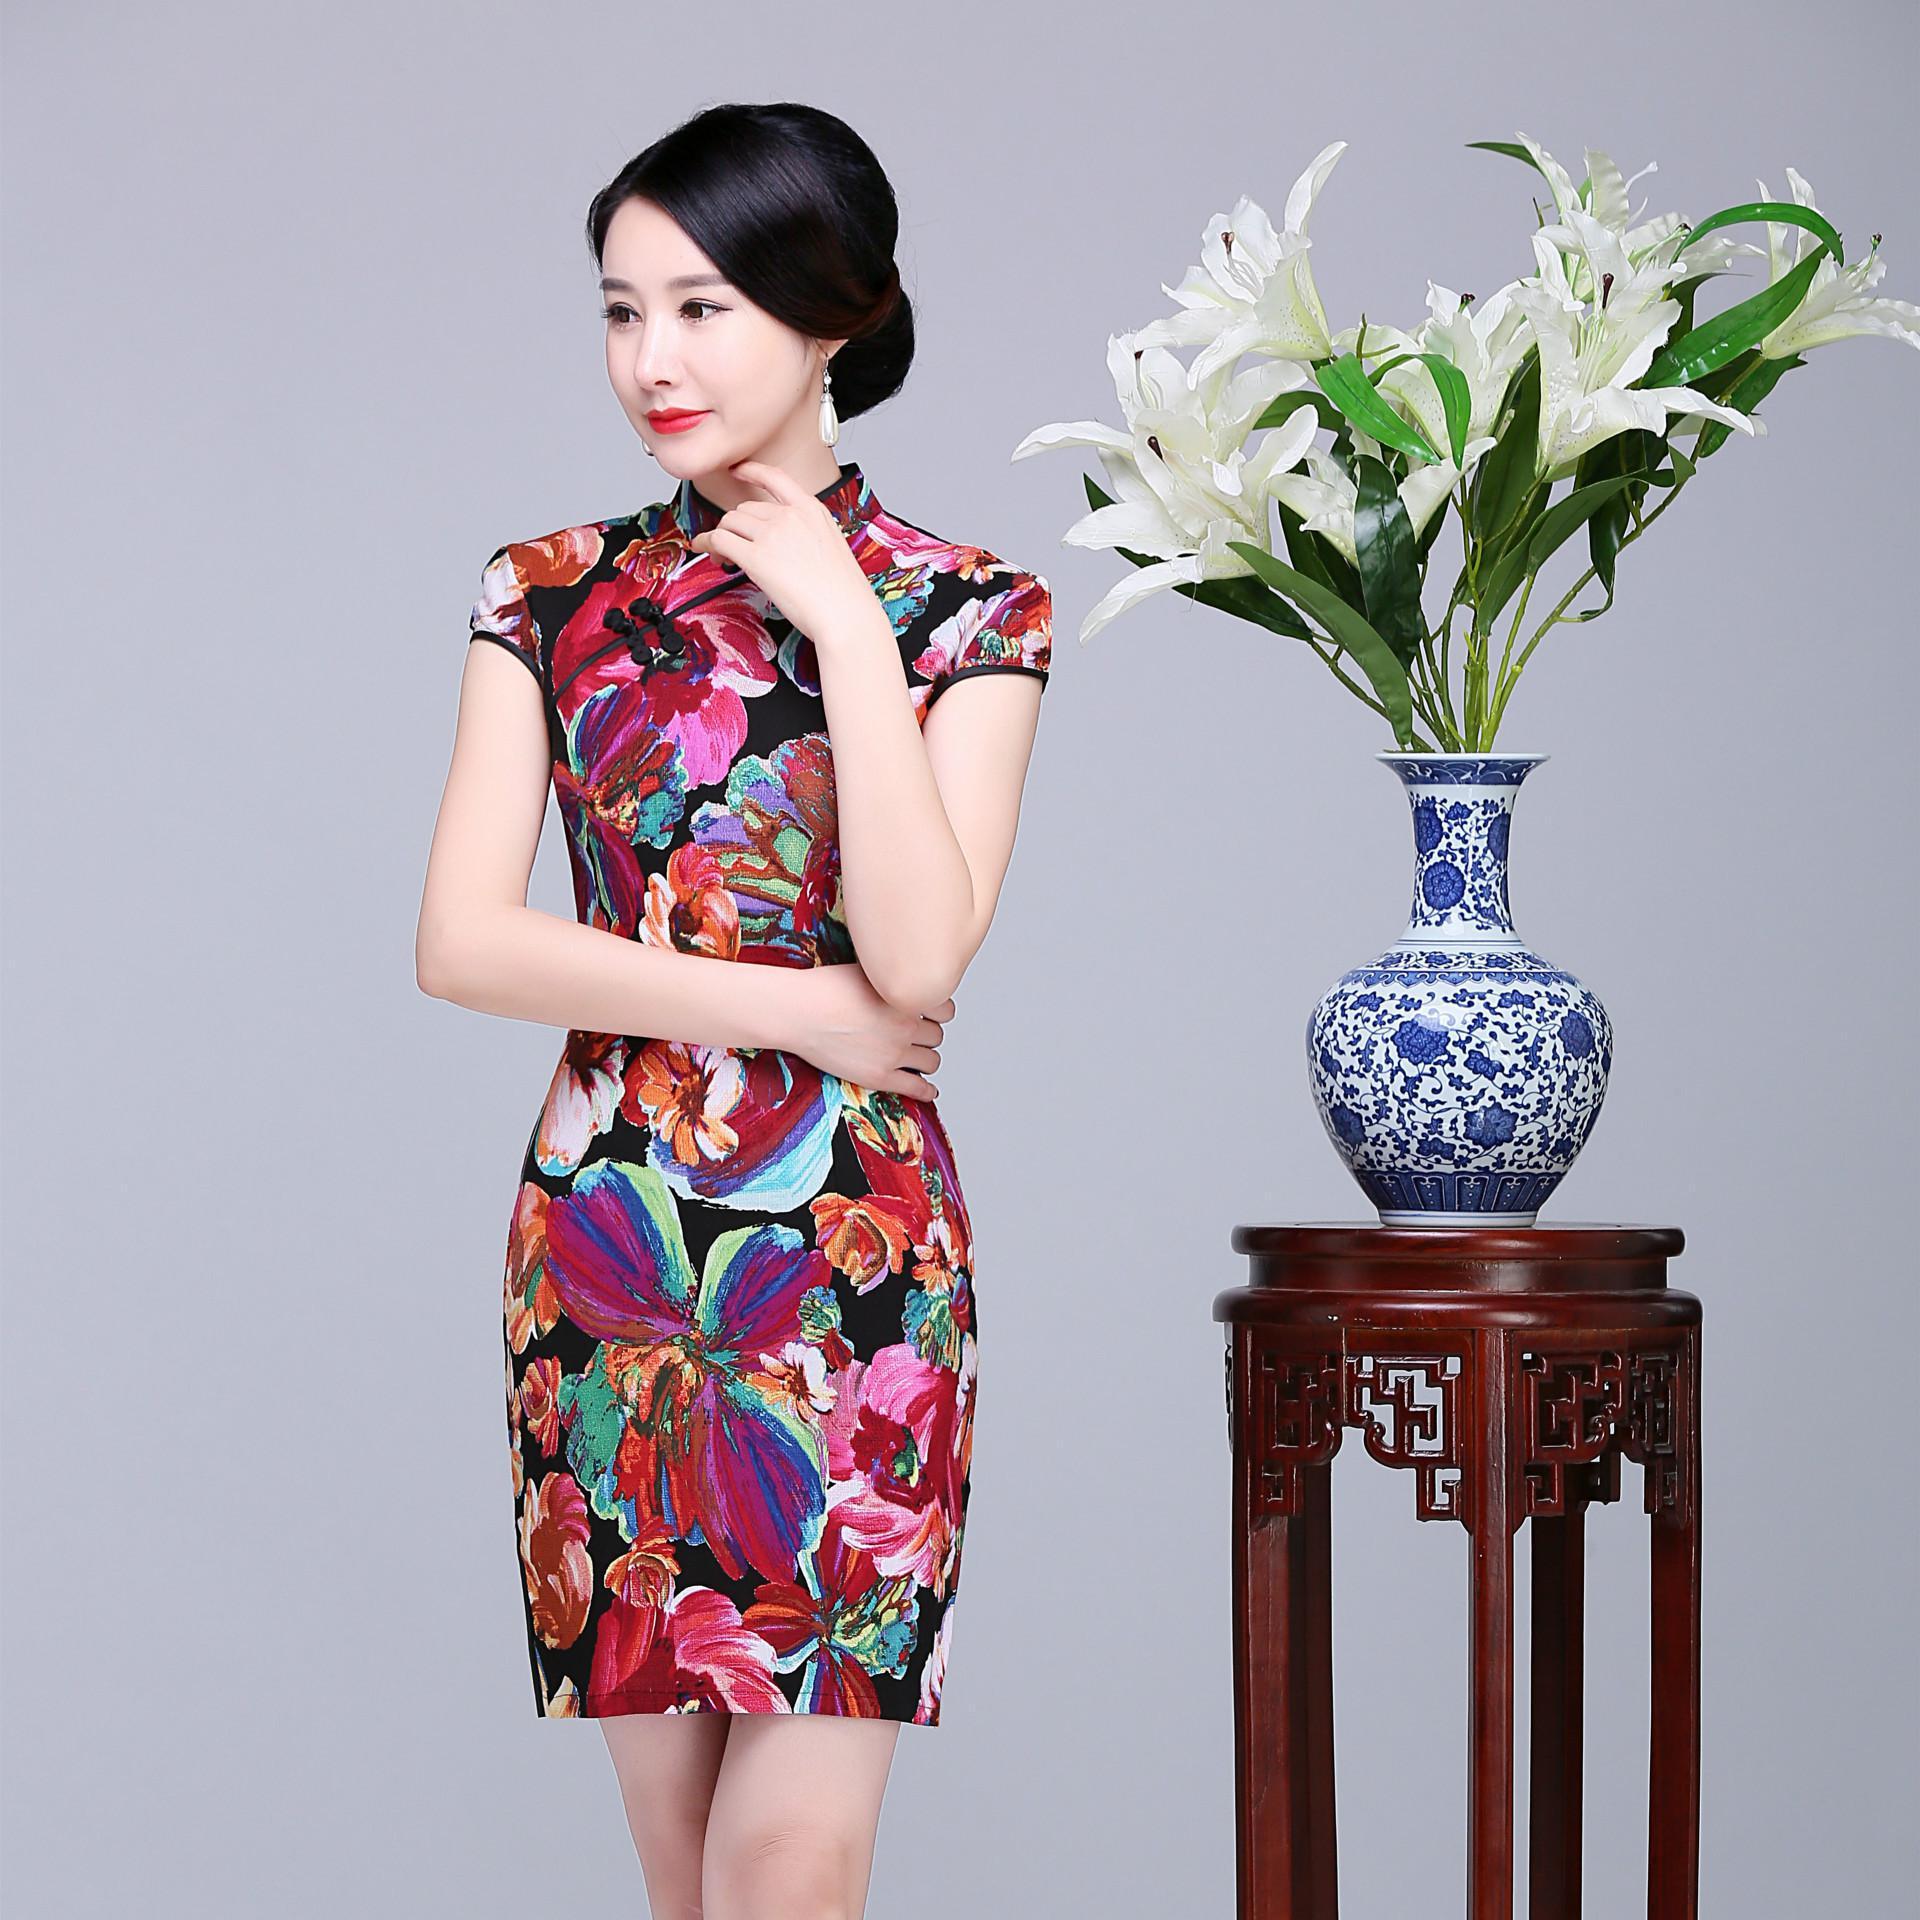 0837551f3 Summer New Vintage Women Fashion Qipao Elegant Cotton Linen Cheongsam Sexy  Print Flower Stage Show Dress Plus Size 3XL 4XL 5XL-in Cheongsams from  Novelty ...